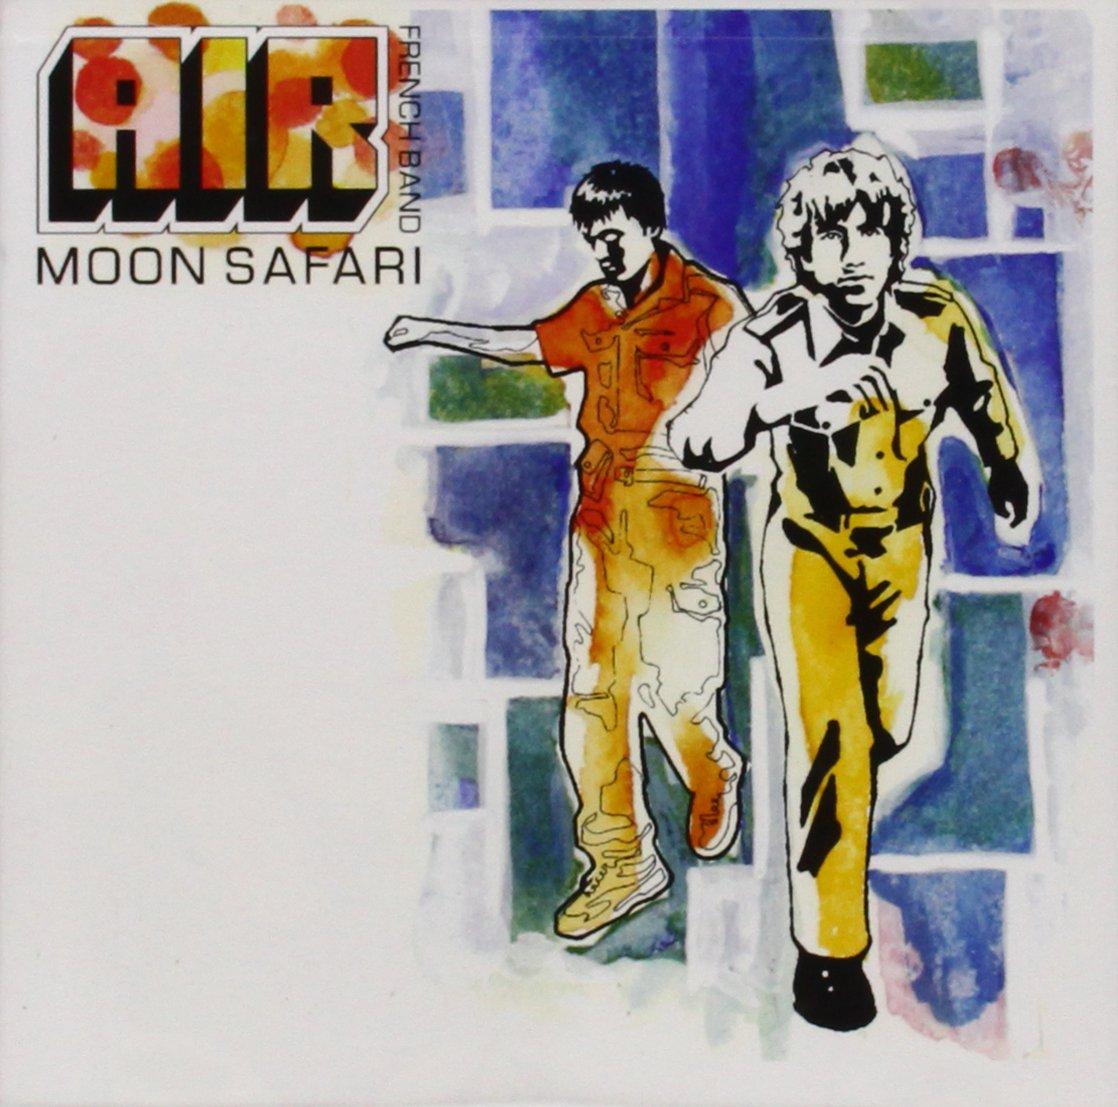 Moon Safari by Parlophone